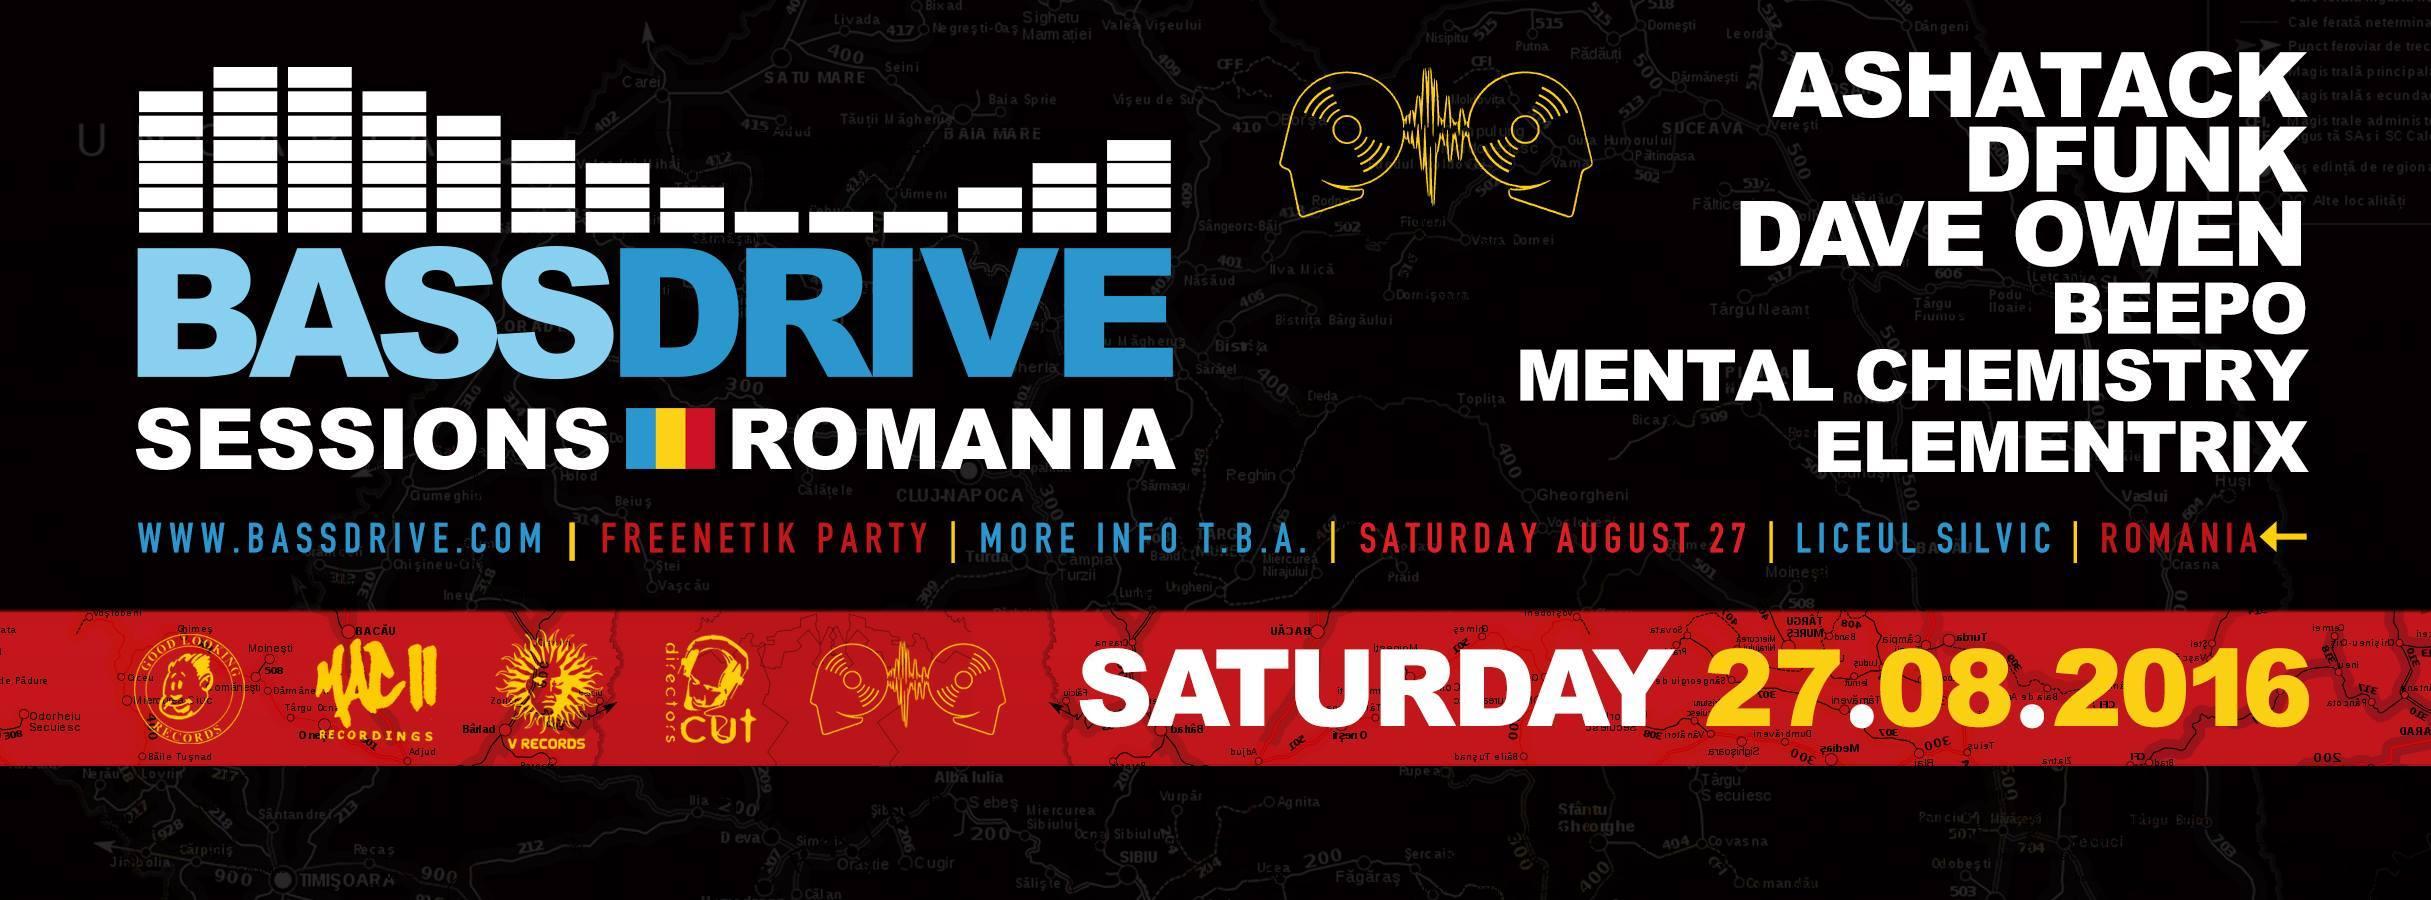 Bassdrive & Freenetik Party